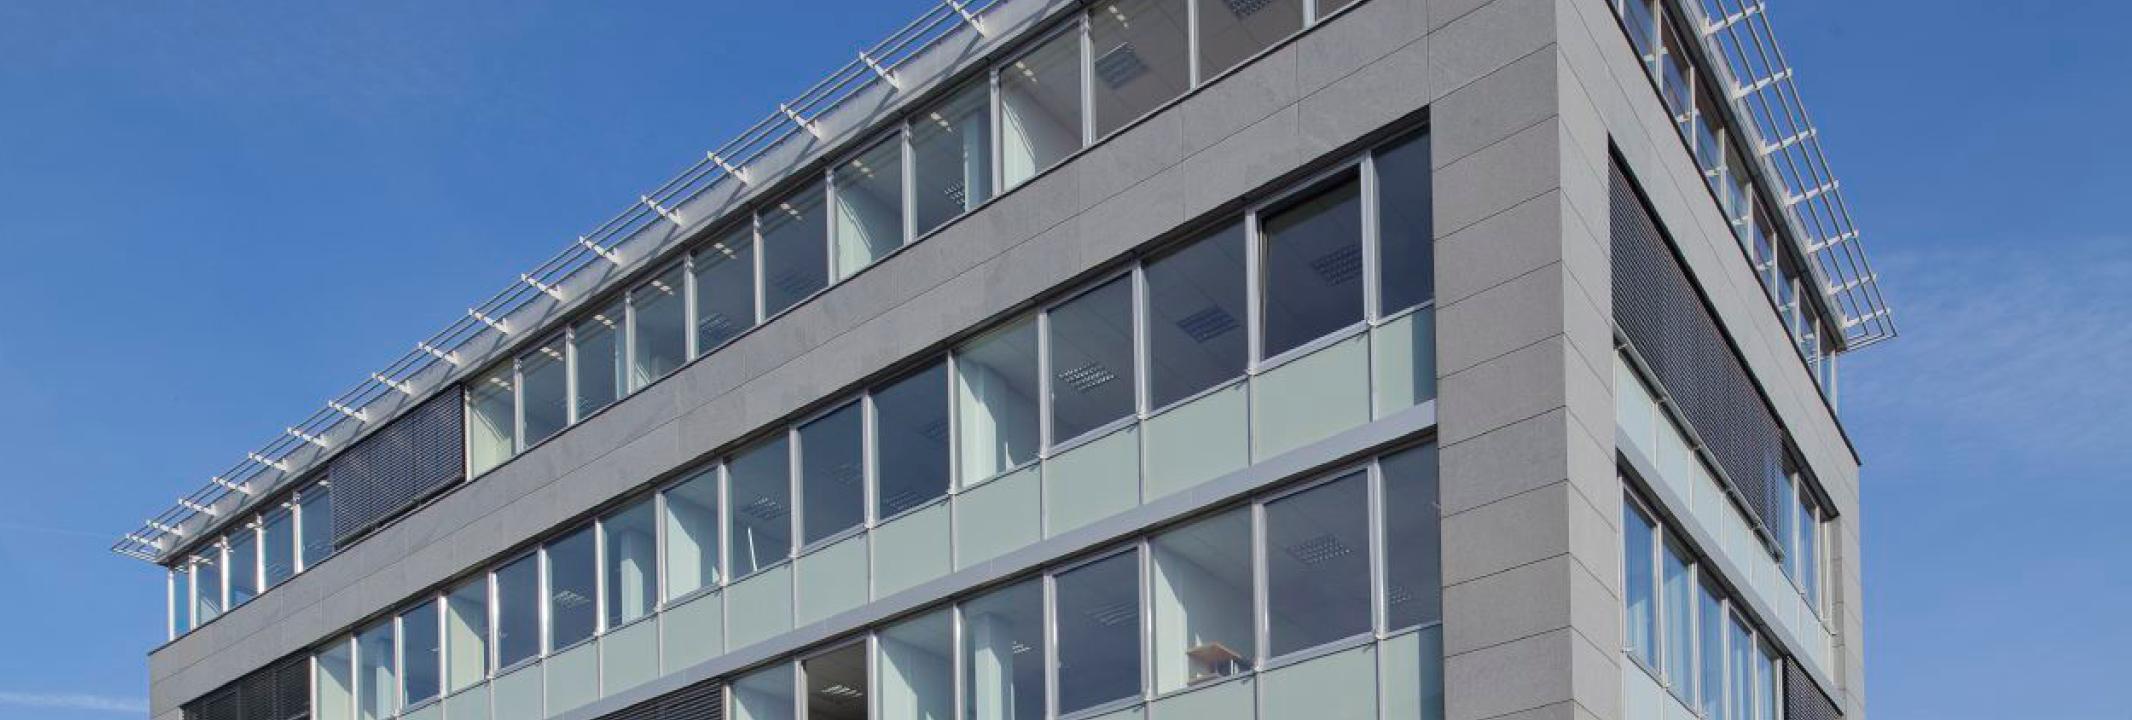 Schweiger Steuerberatung Büro Ingolstadt